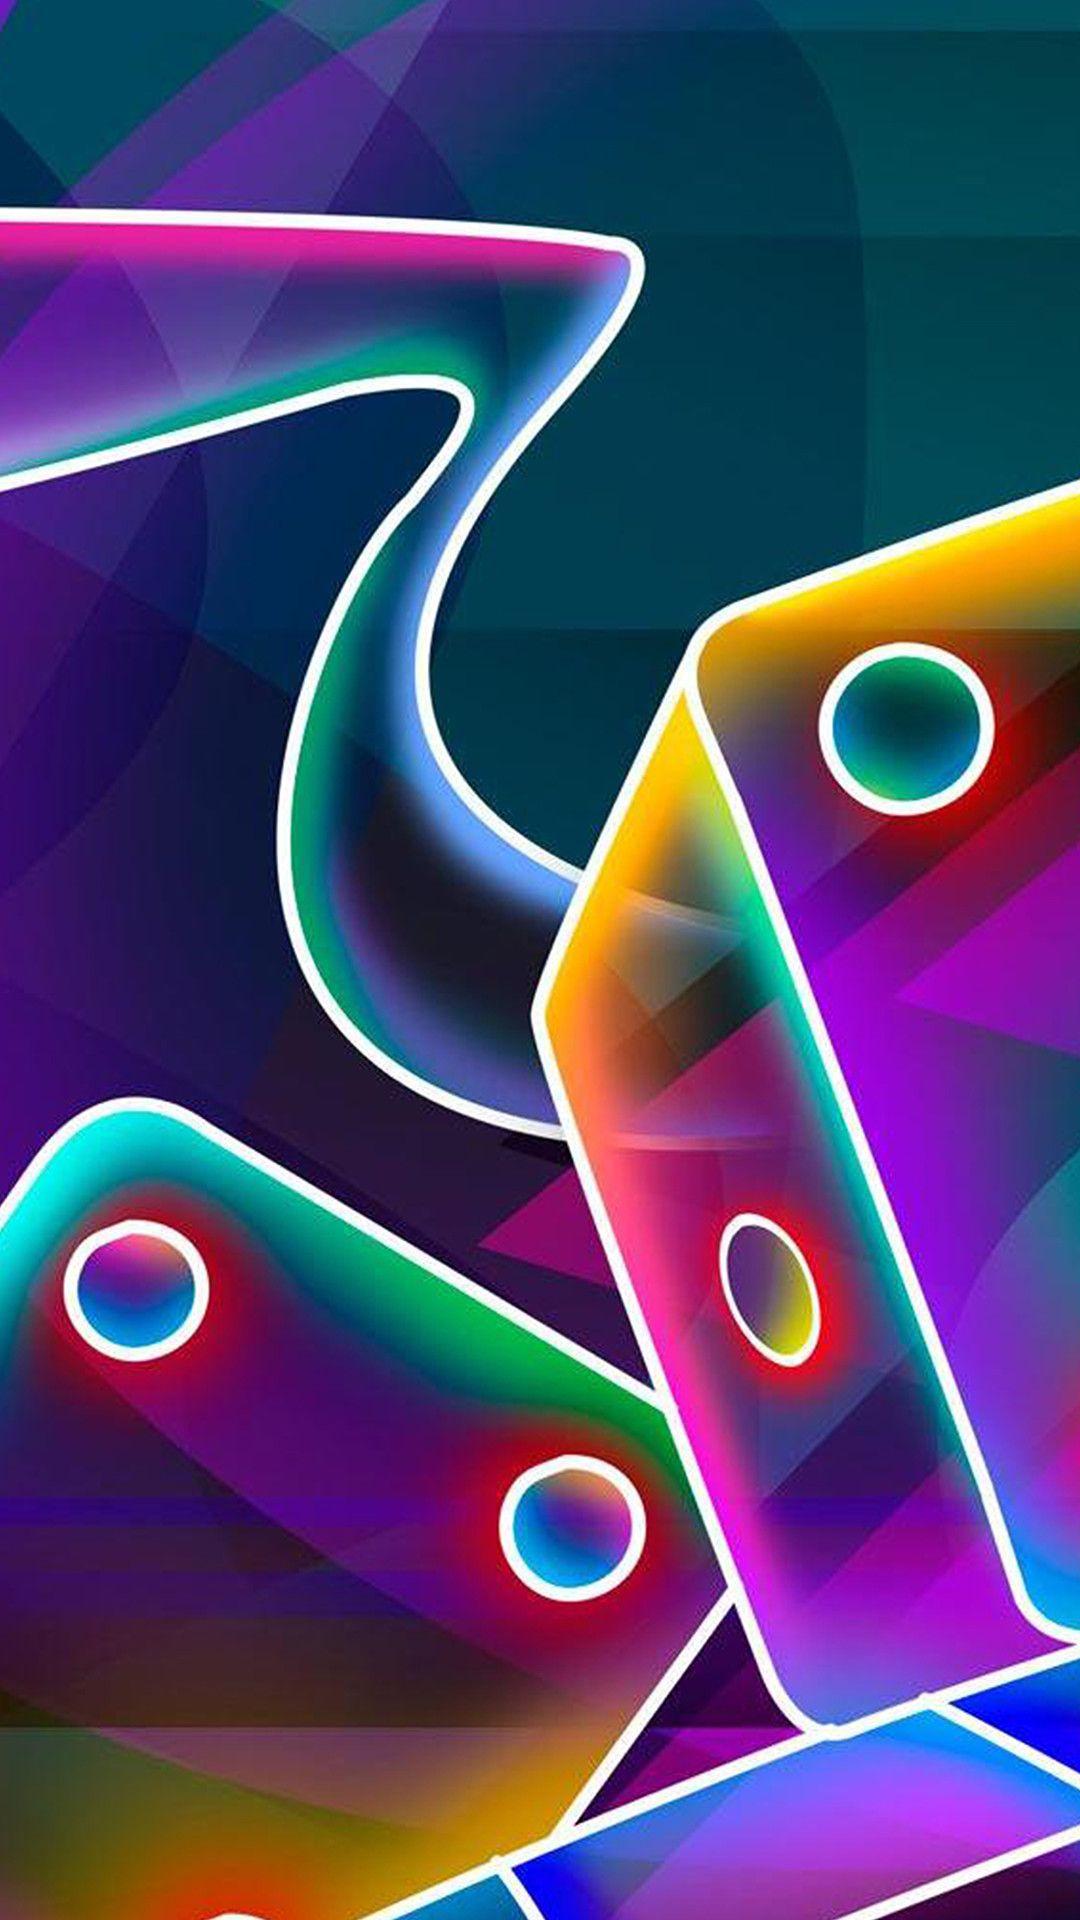 Unduh Wallpaper Neon Estetika pada tahun 2020 |  Wallpaper Neon ...